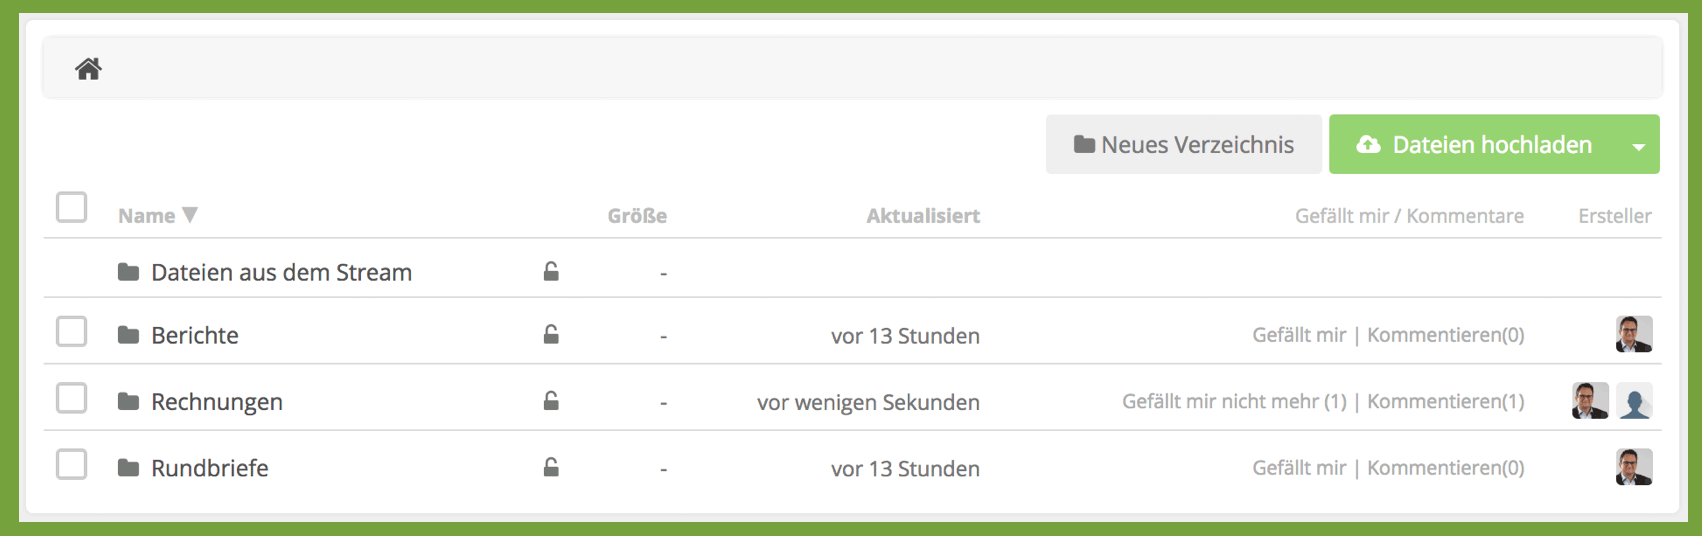 HumHub-Funktion: Dateiverwaltung